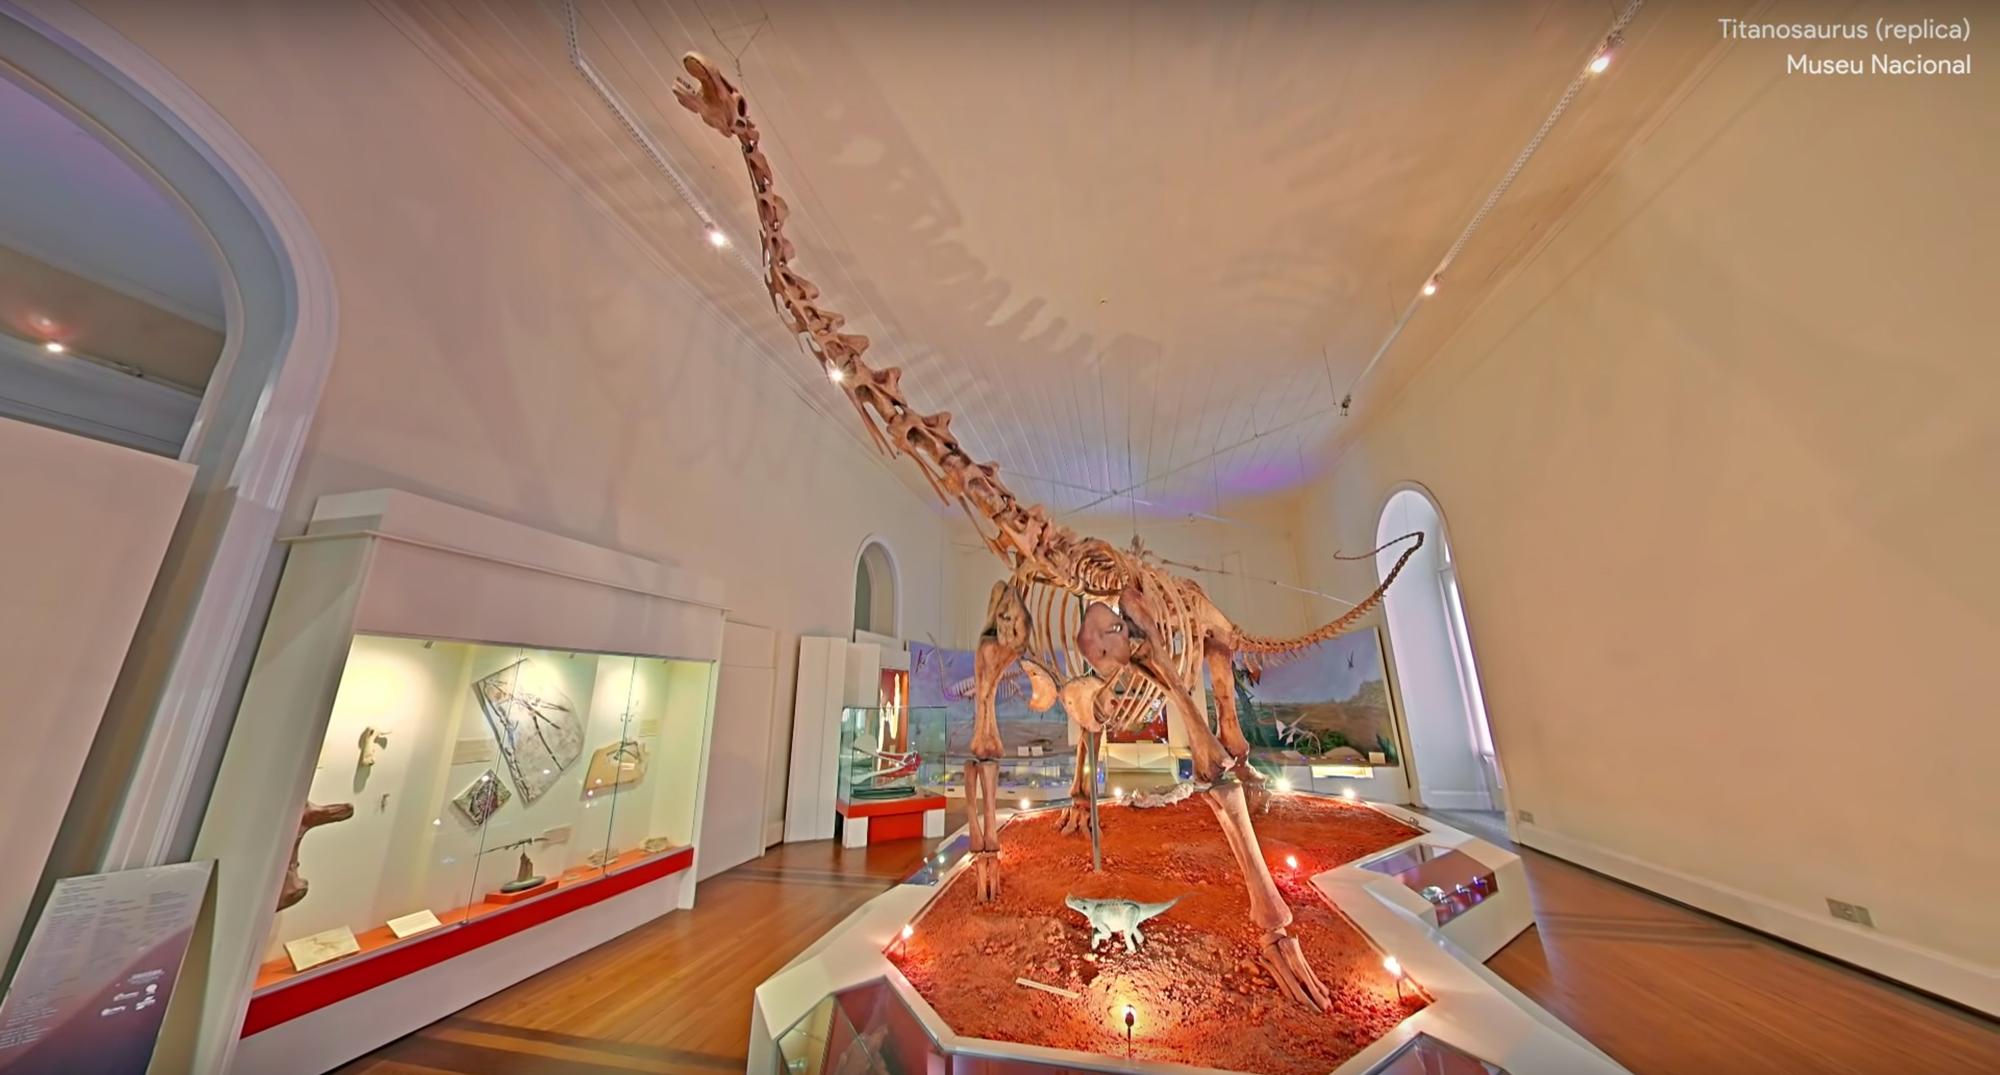 Insdie Brazils Museu Nacional Google Museum View | Collater.al